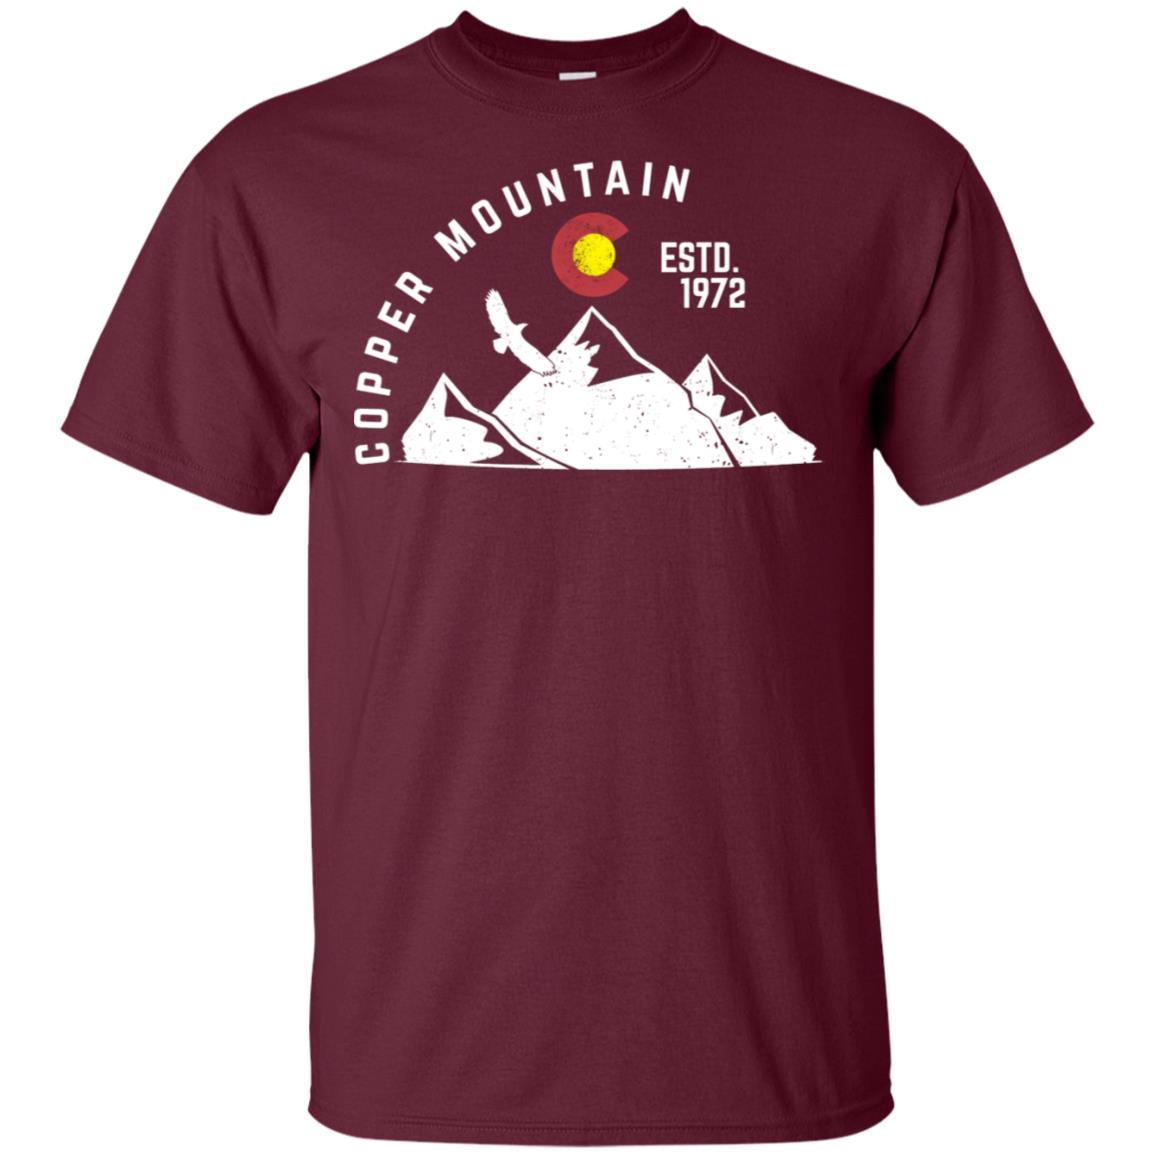 Copper Mountain Estd 1972 Colorado Unisex Short Sleeve